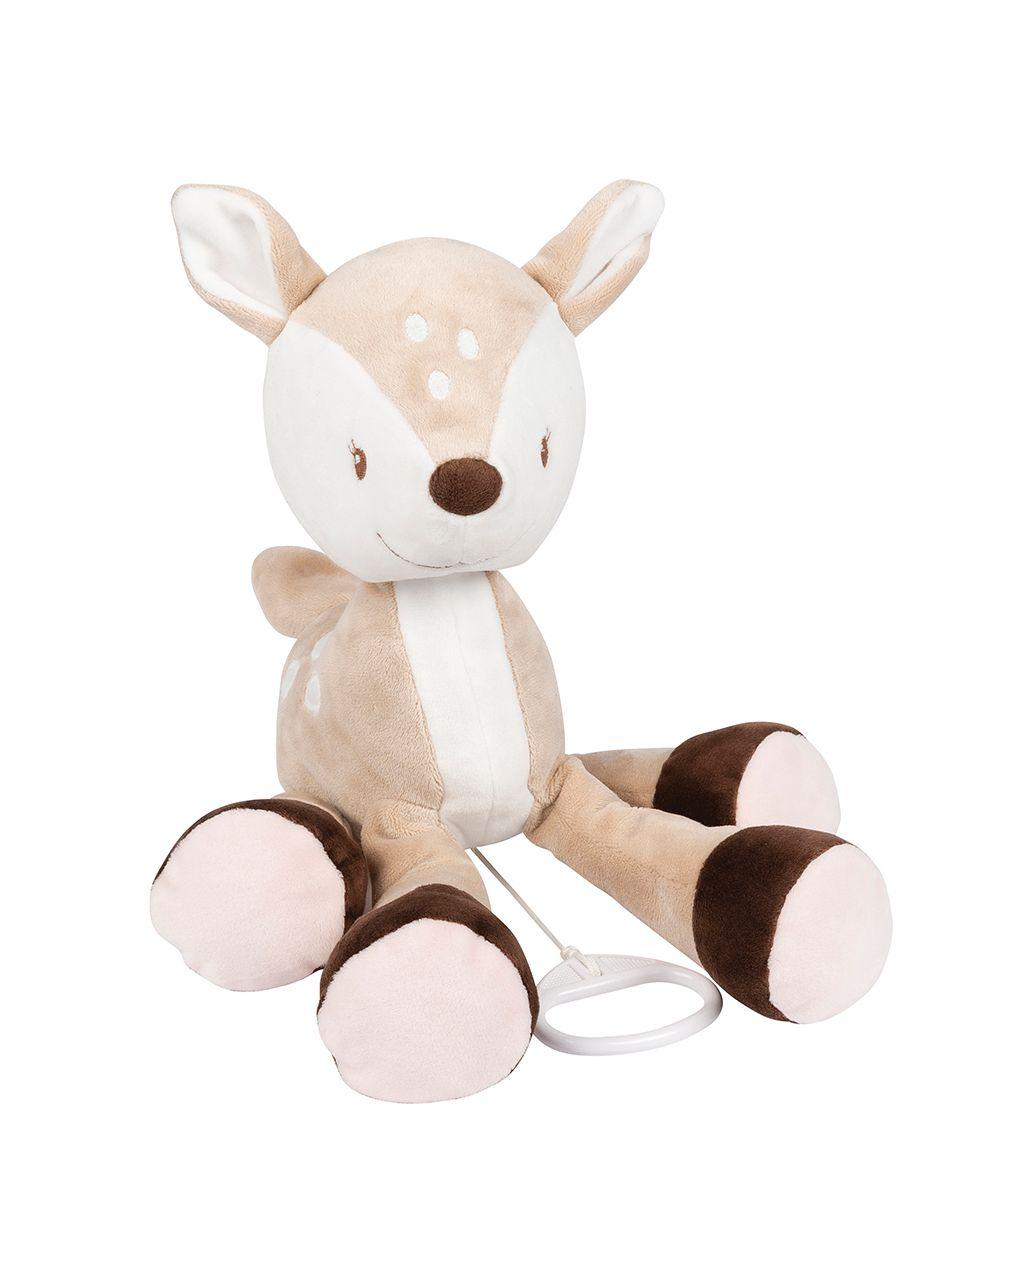 Nattou - caixa de música fanny il bambi - Nattou